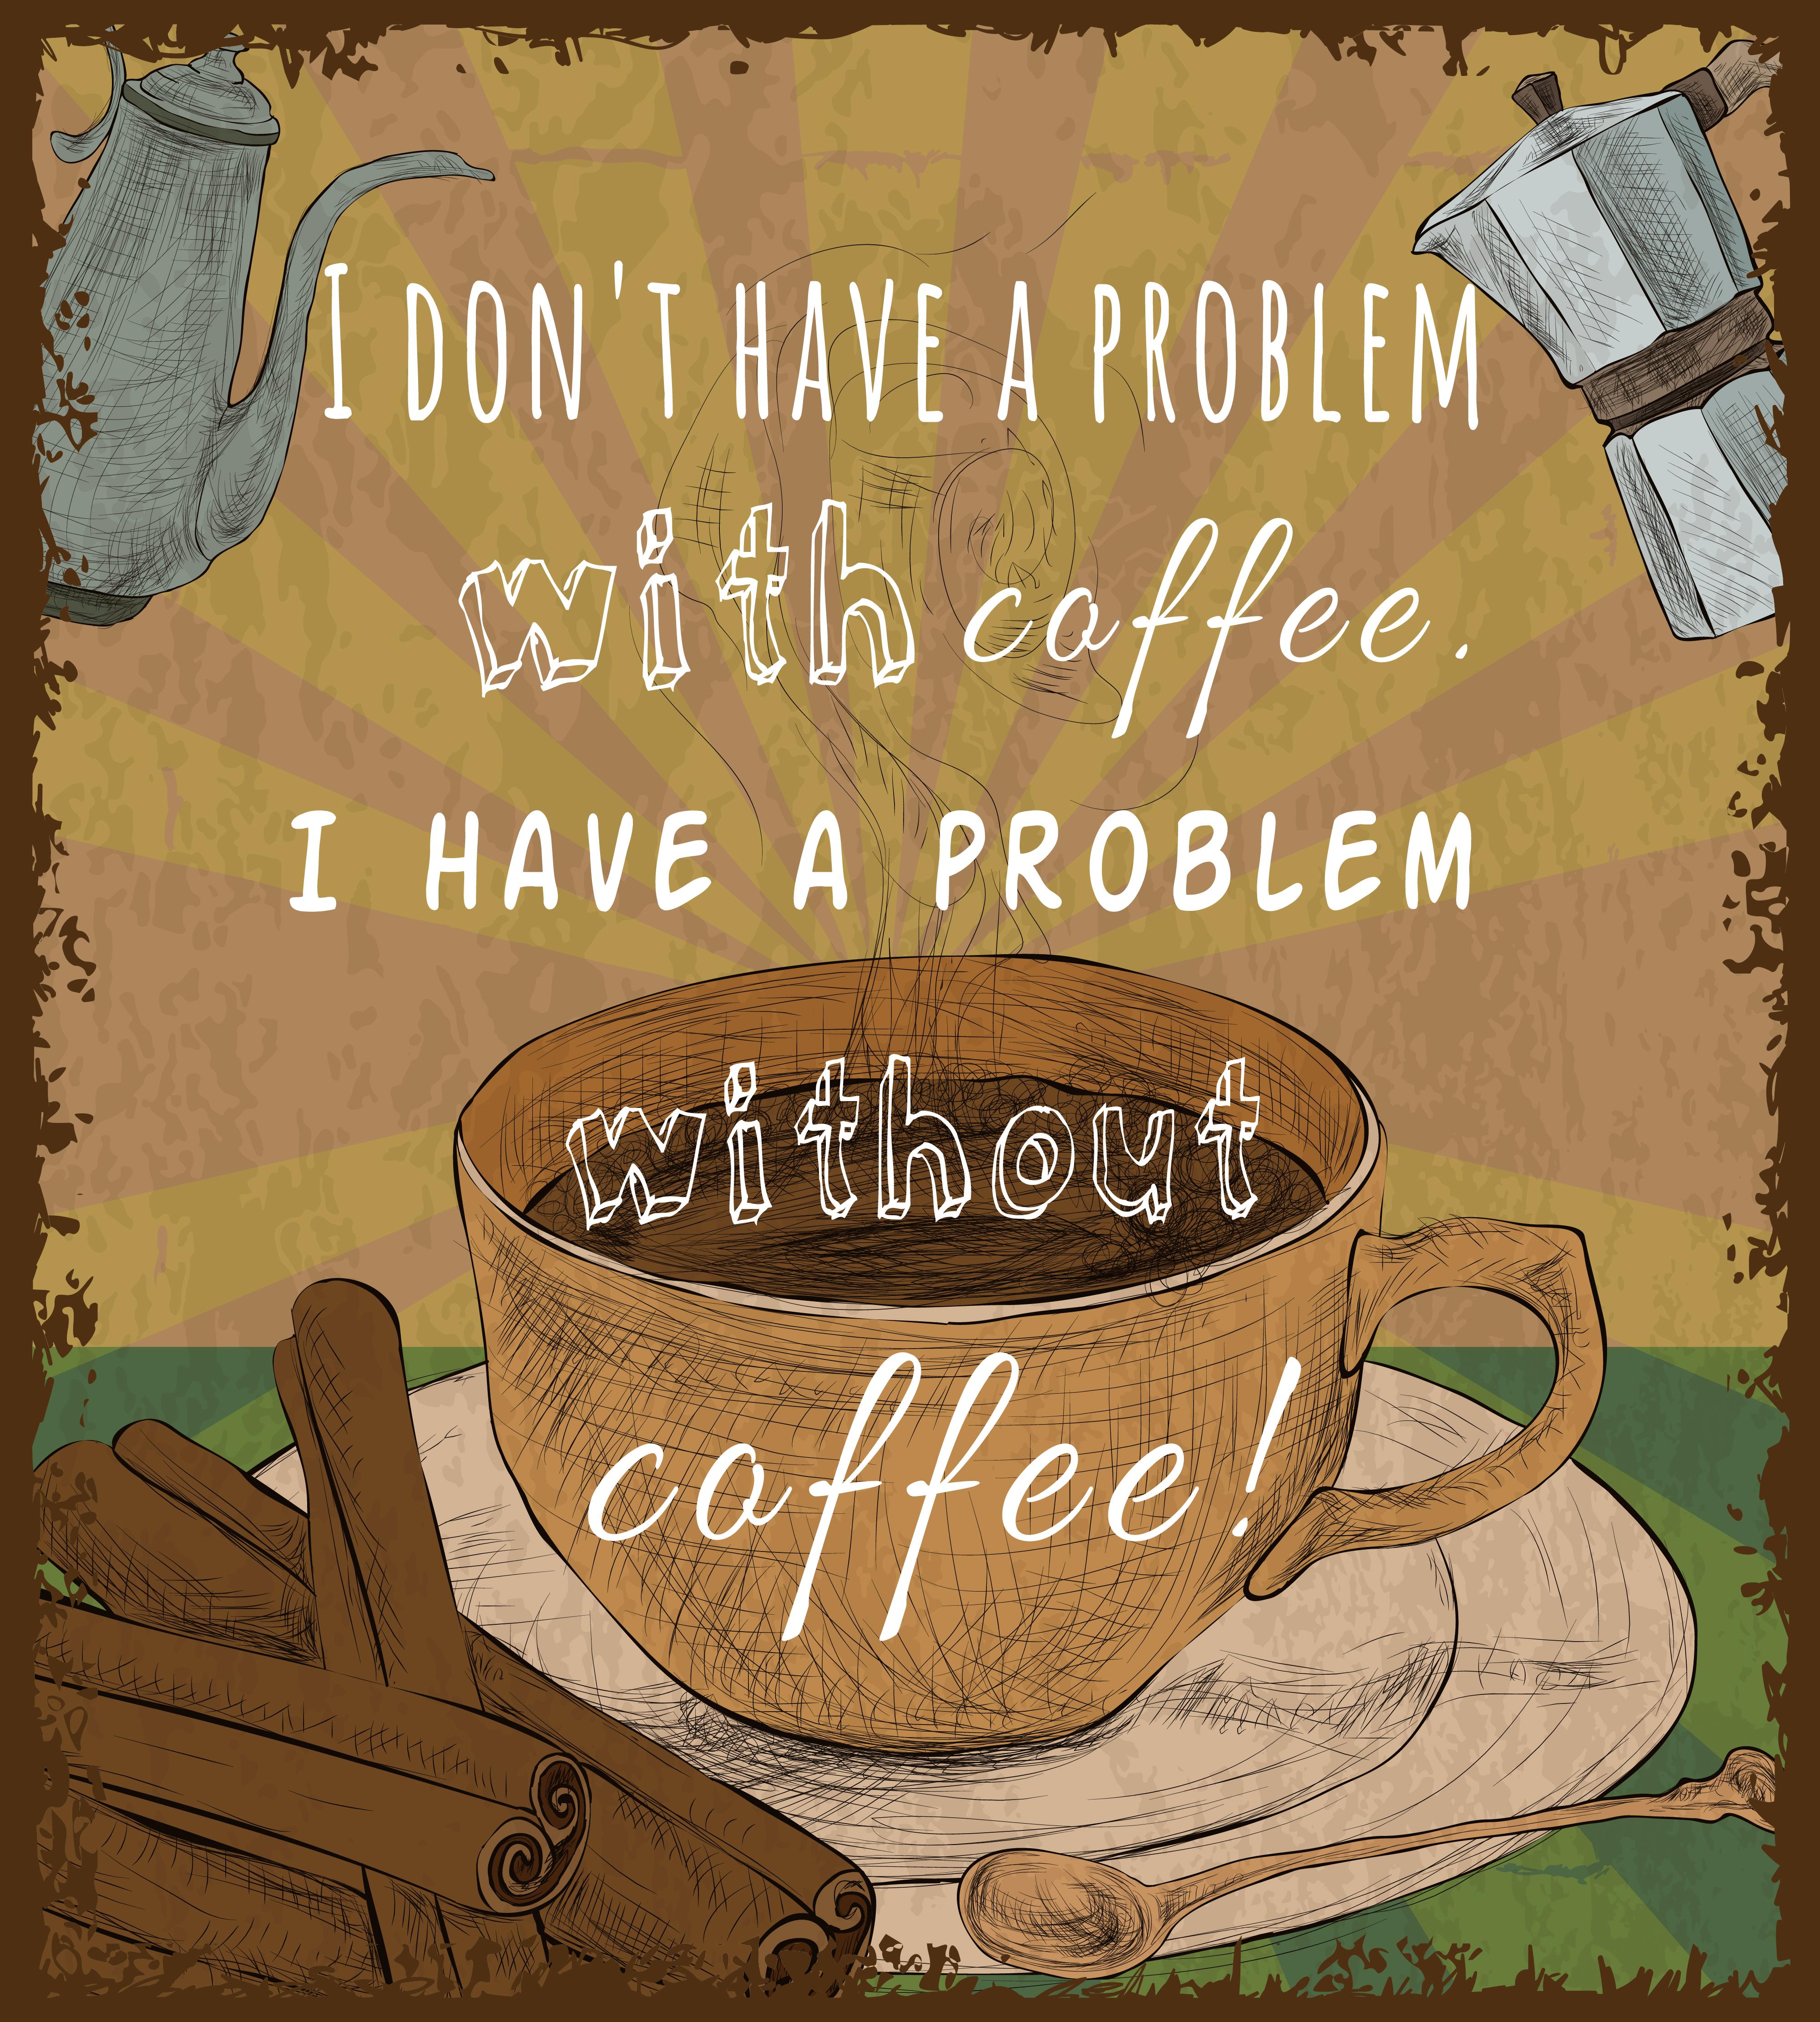 Retro coffee cup poster - Download Free Vectors, Clipart Graphics & Vector Art